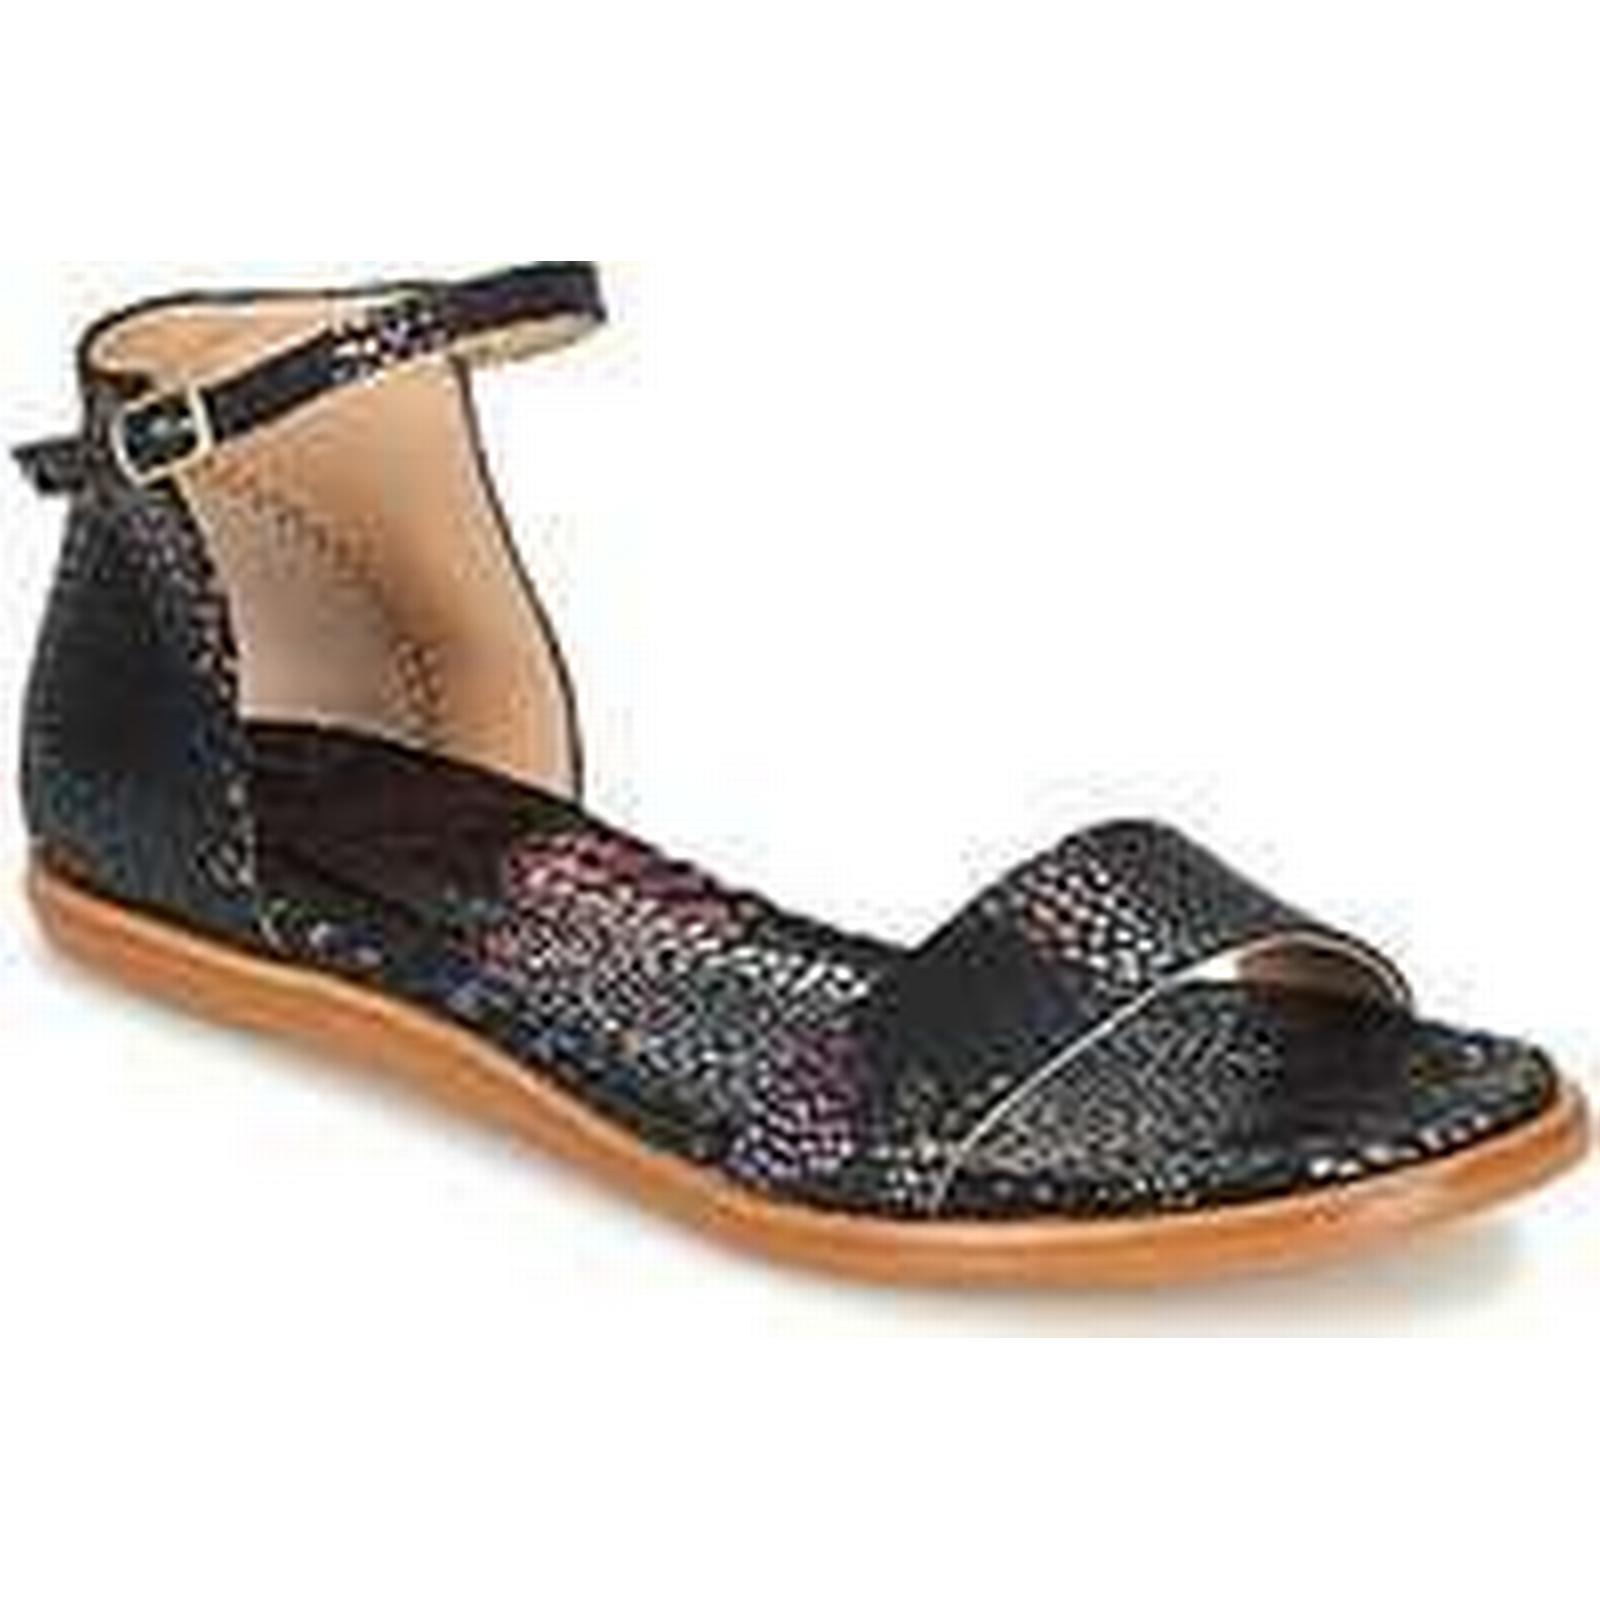 Spartoo.co.uk Neosens AURORA women's Sandals Black in Black Sandals 1b961a